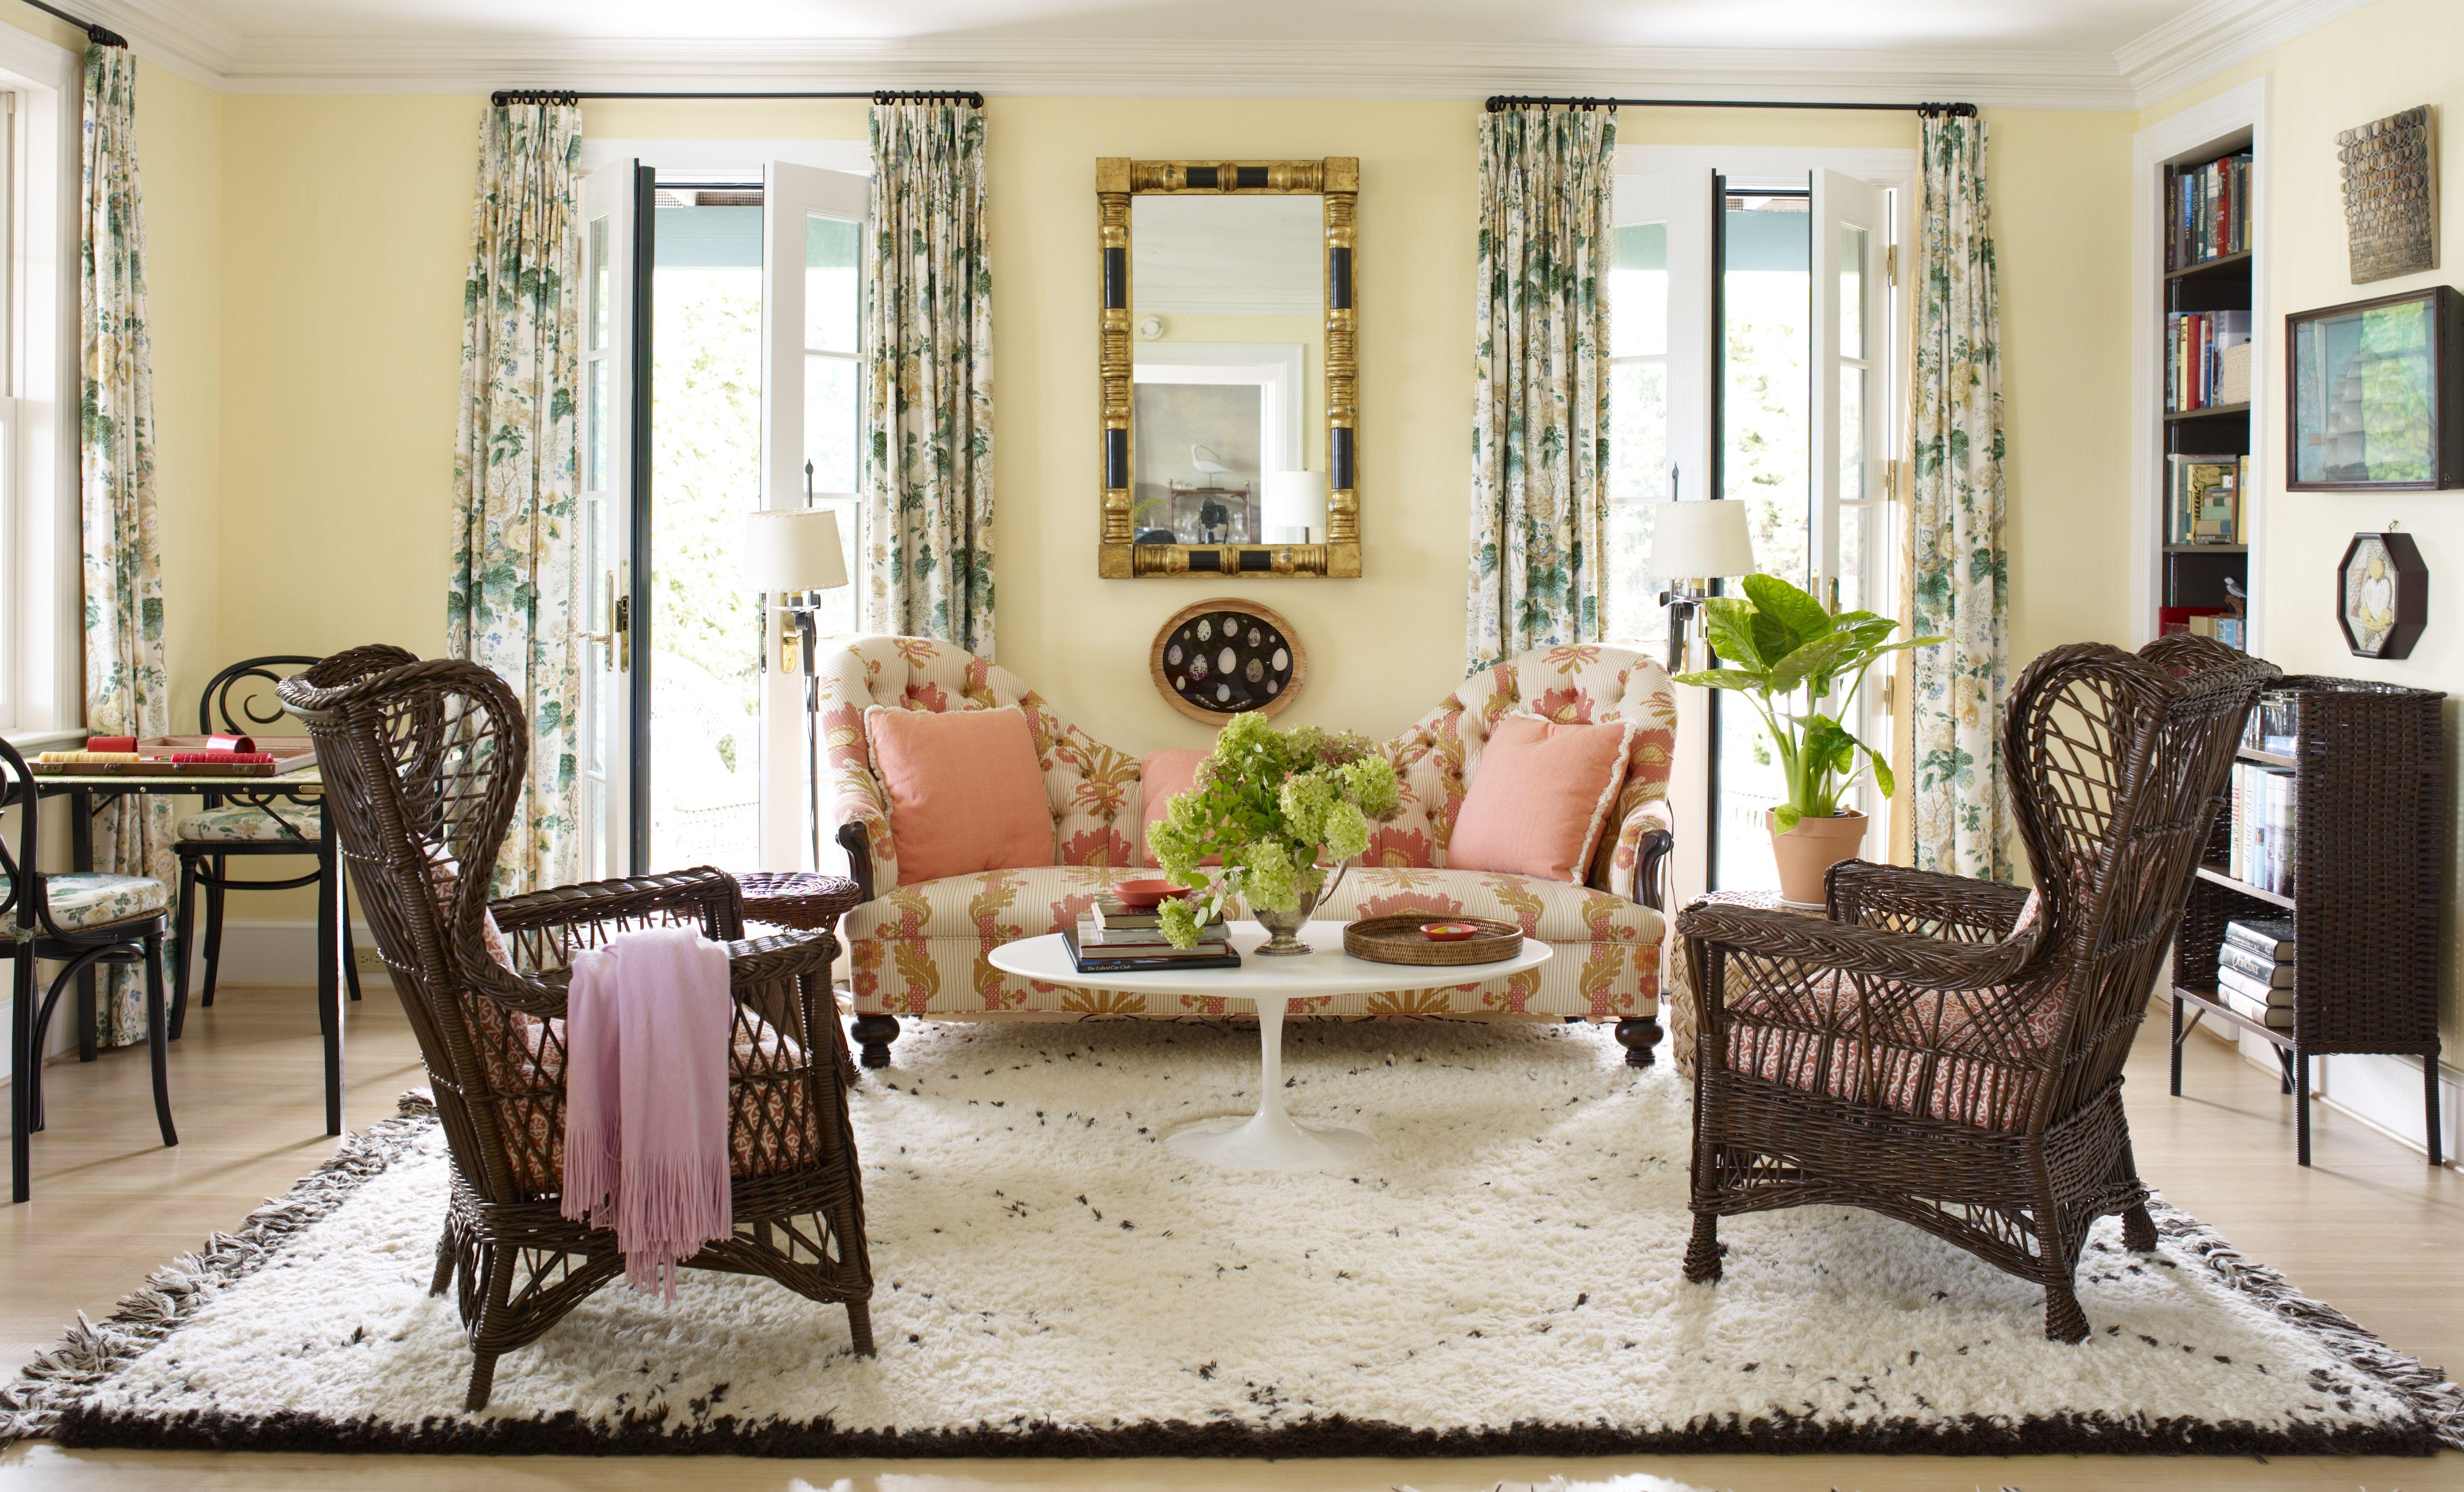 tom scheerer mount desert island maine in the living room a